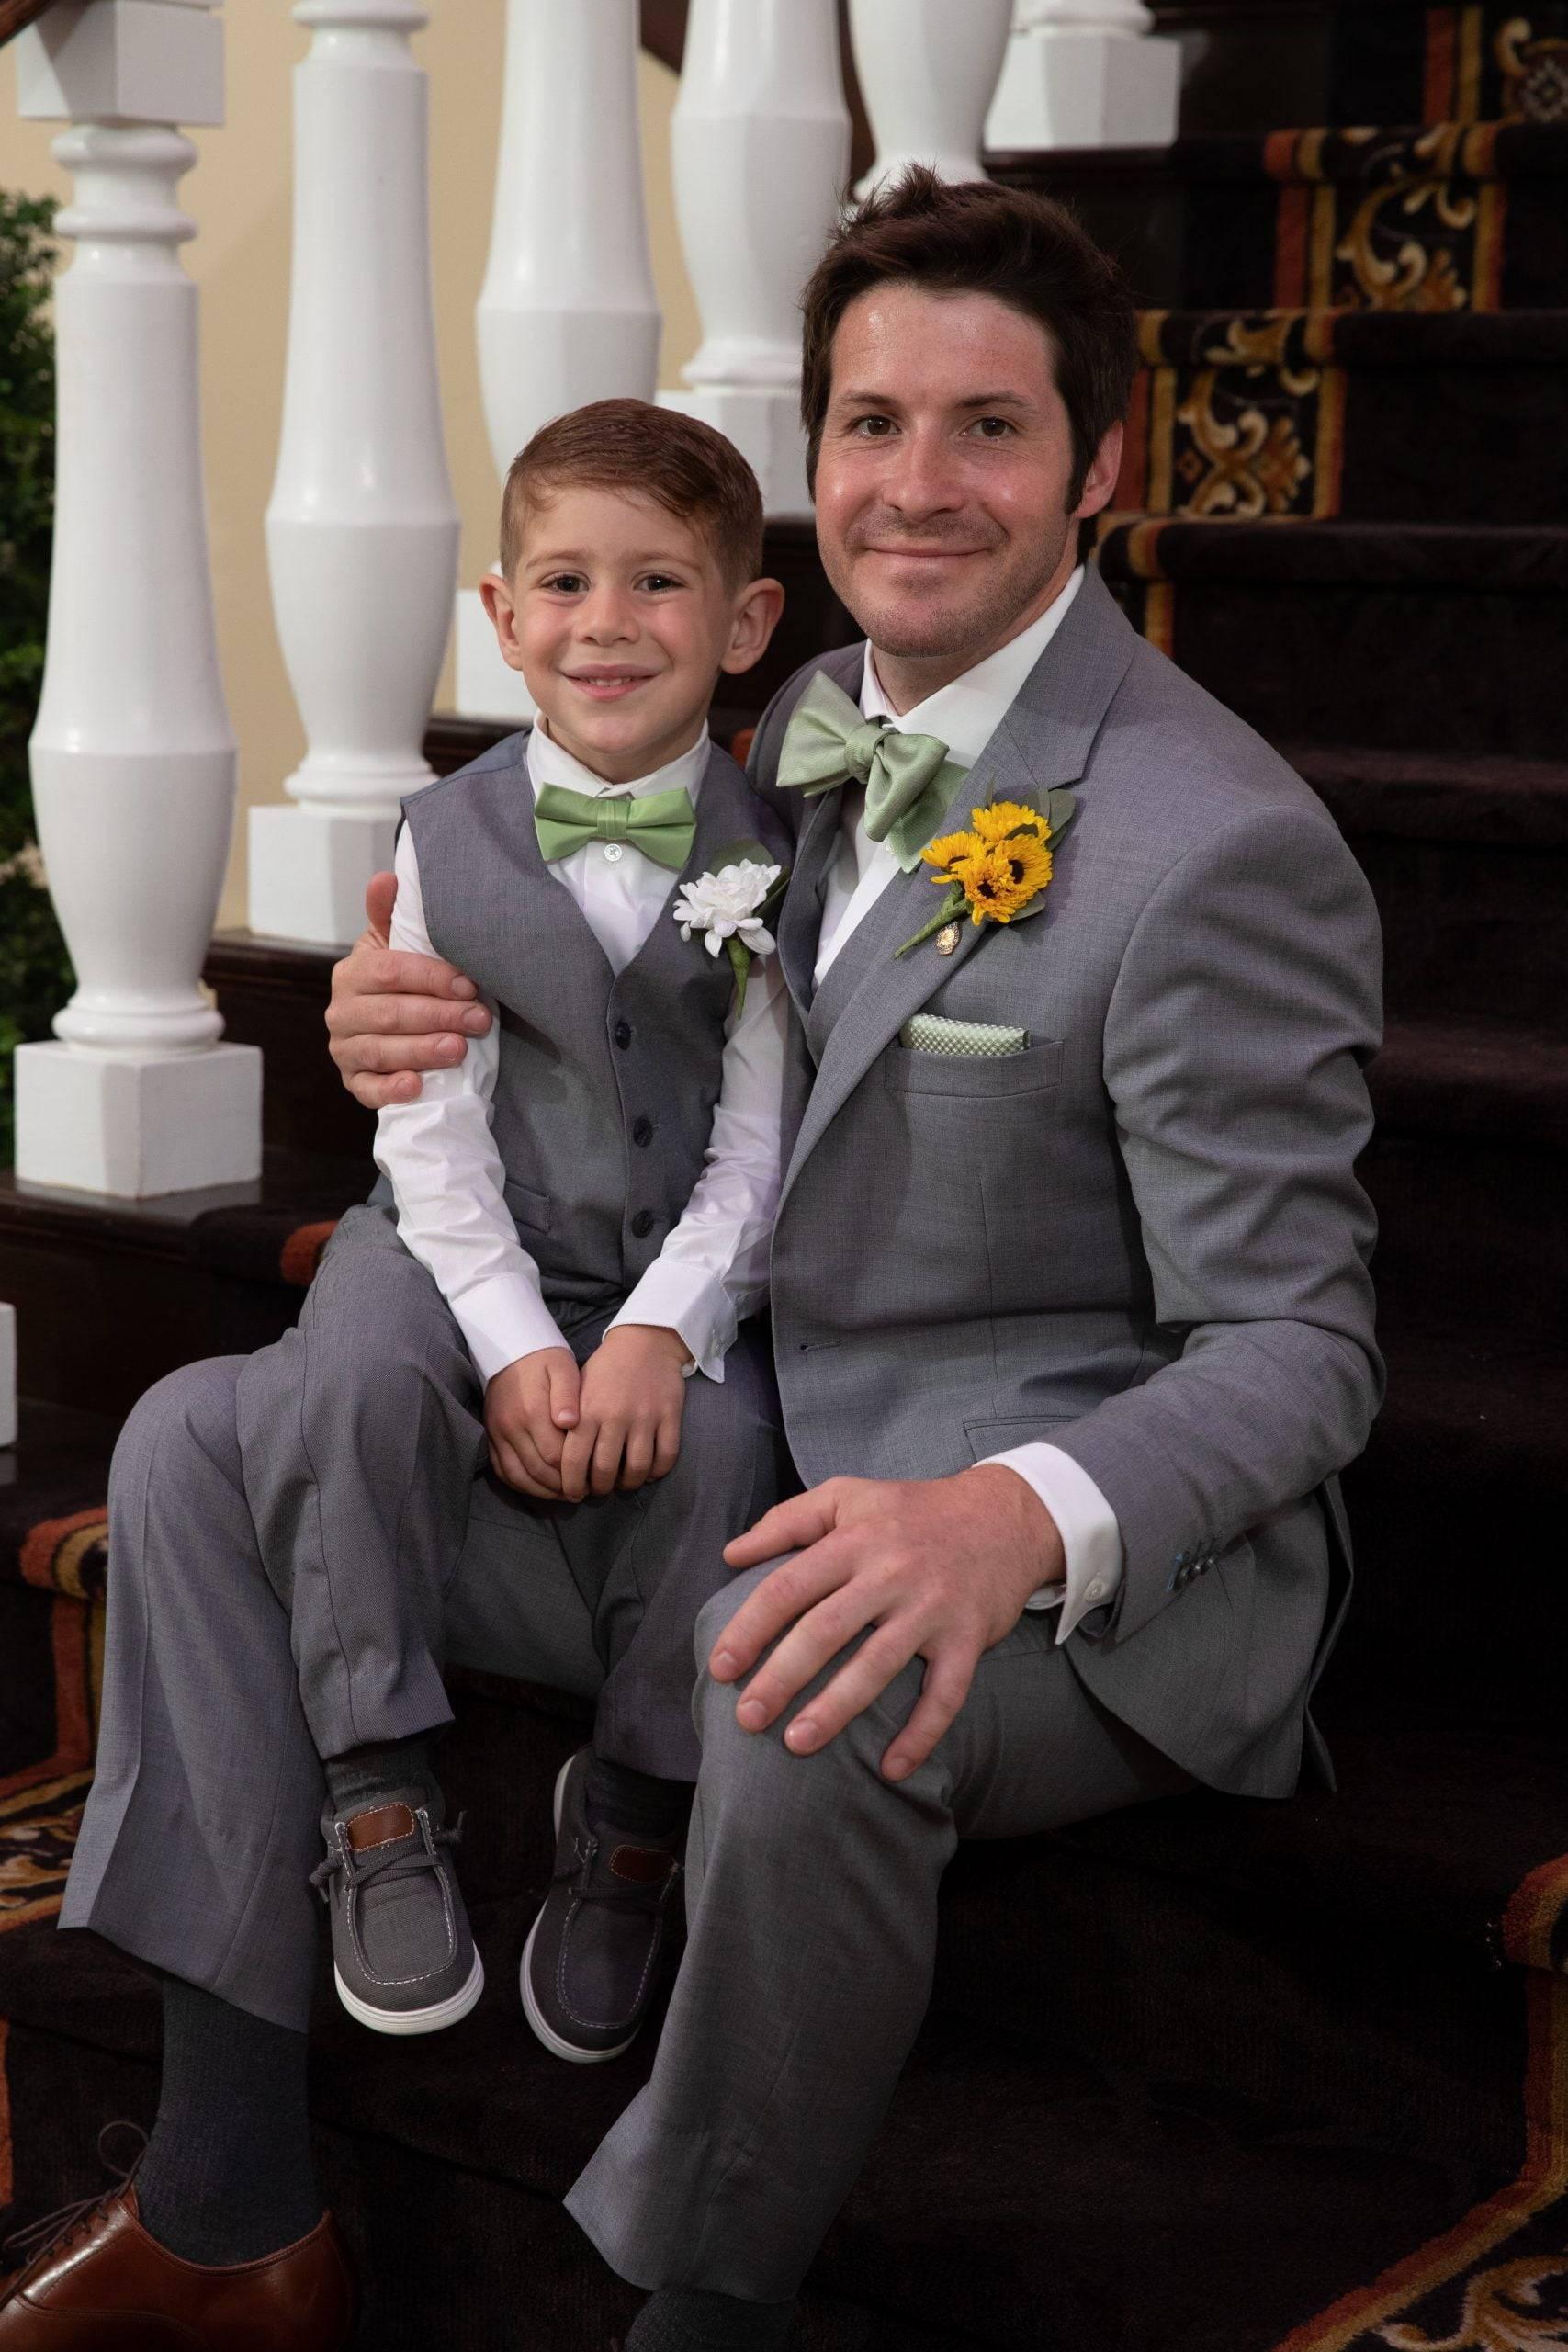 Bridgewater Manor ring bearer with groom on staircase